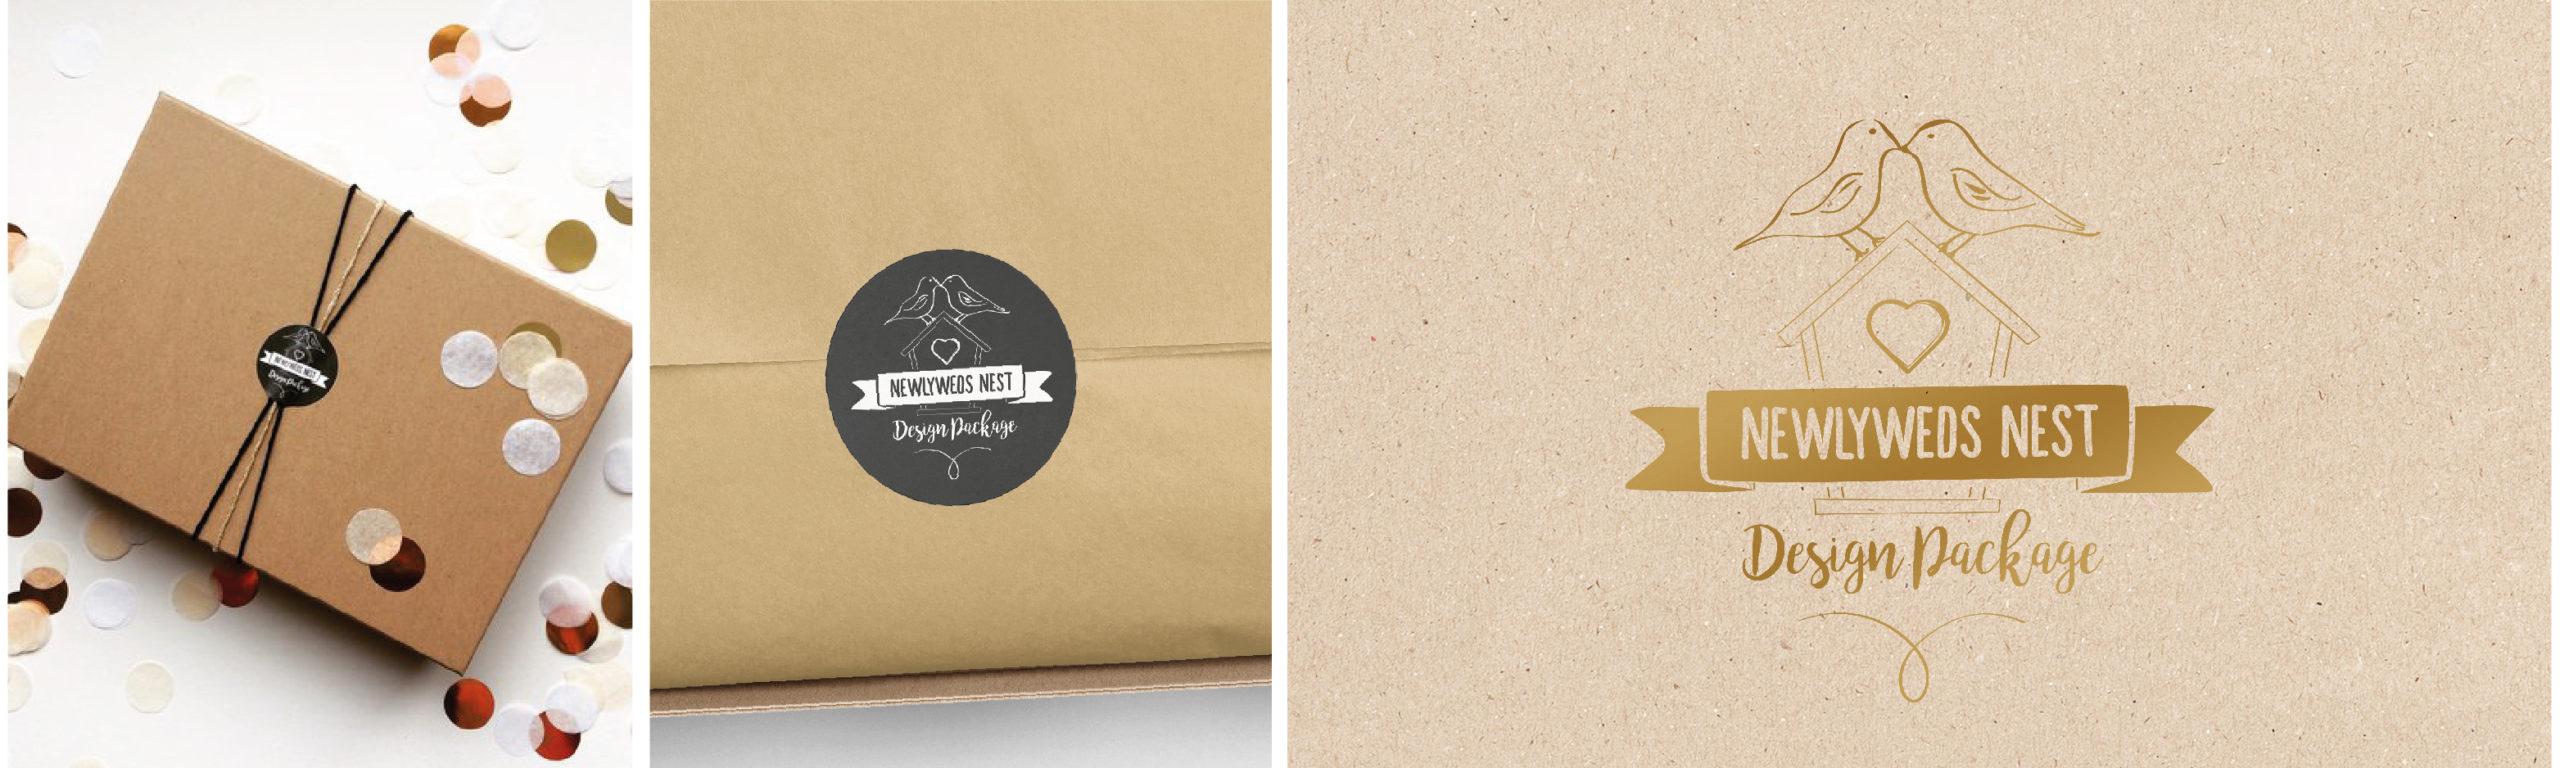 Newlyweds Nest, Interior design service in a box, Header image